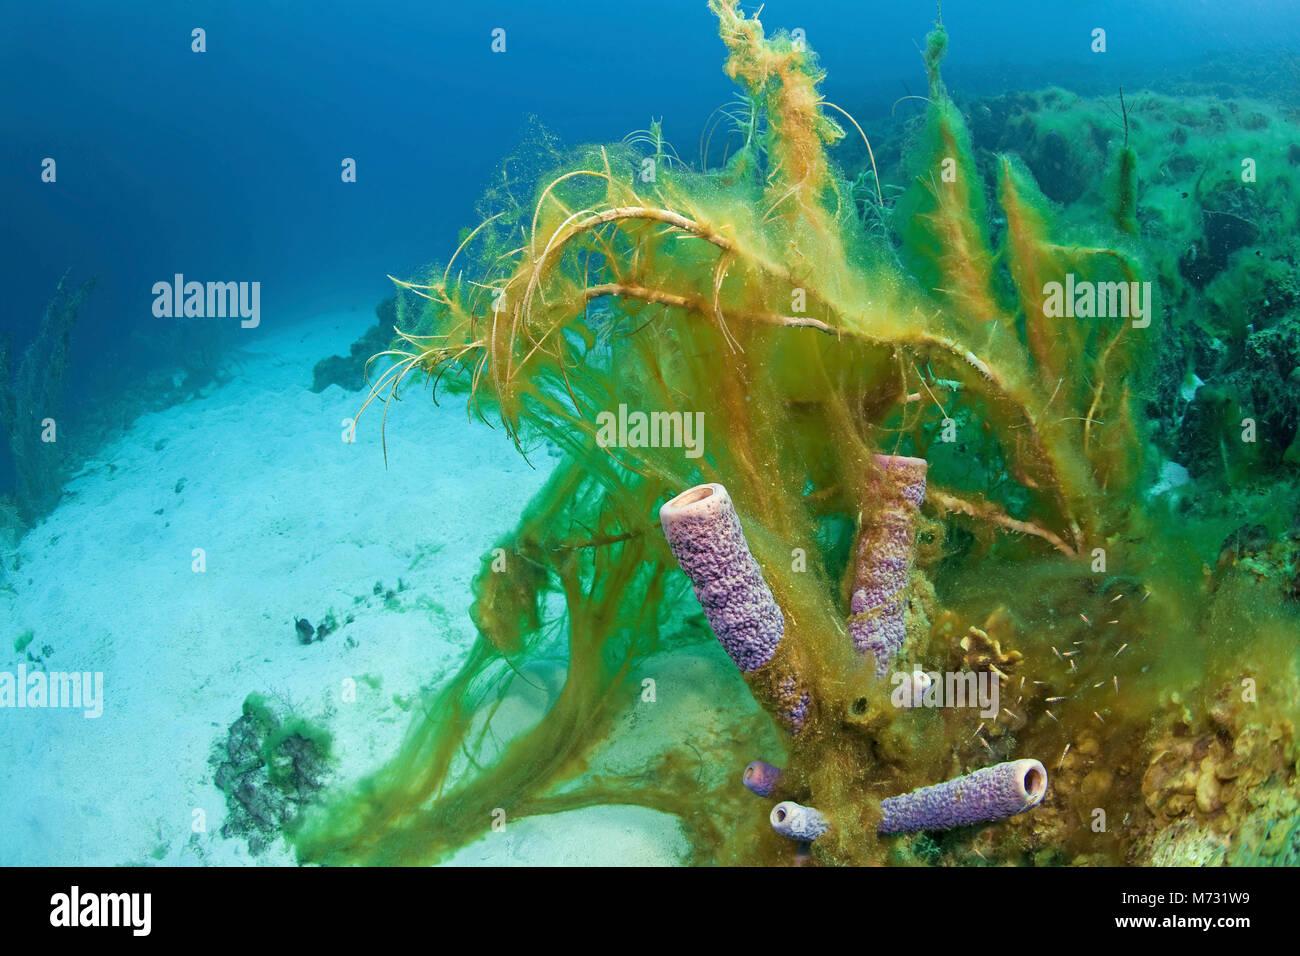 Algae overrun a dead coral reef, Curacao, Netherlands Antilles, Caribbean, Caribbean sea - Stock Image